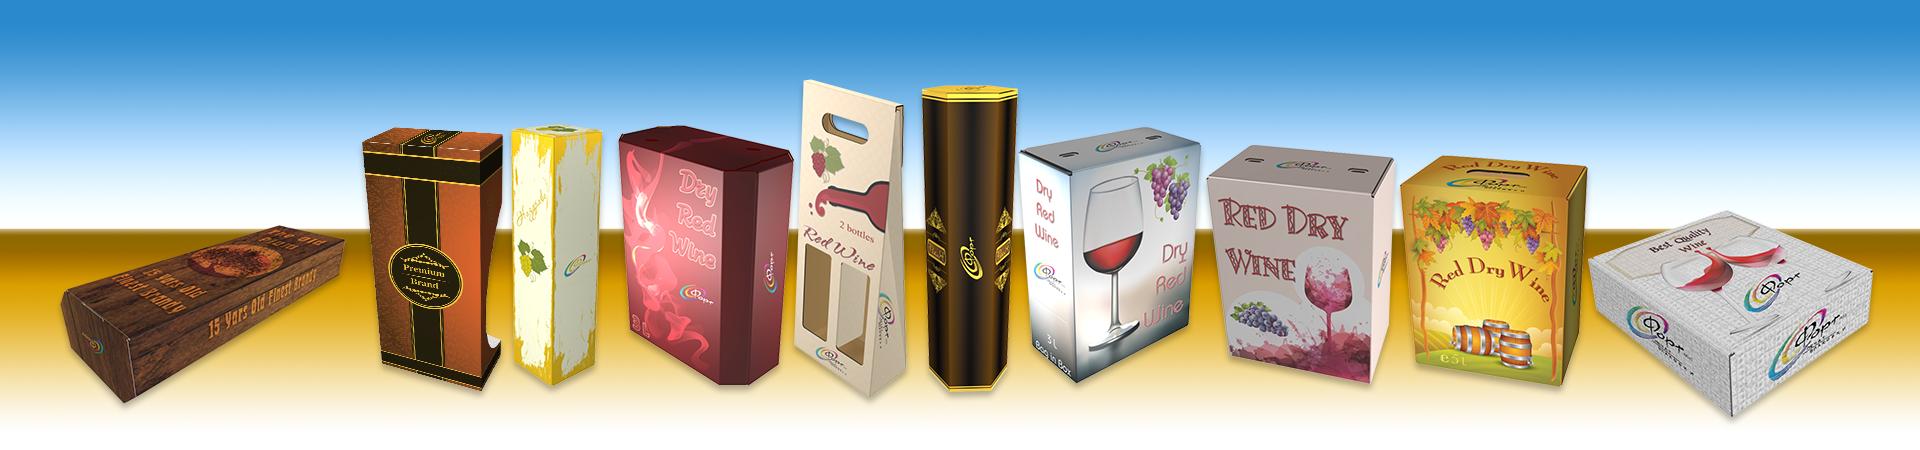 wine-industry-head-image-fort-1